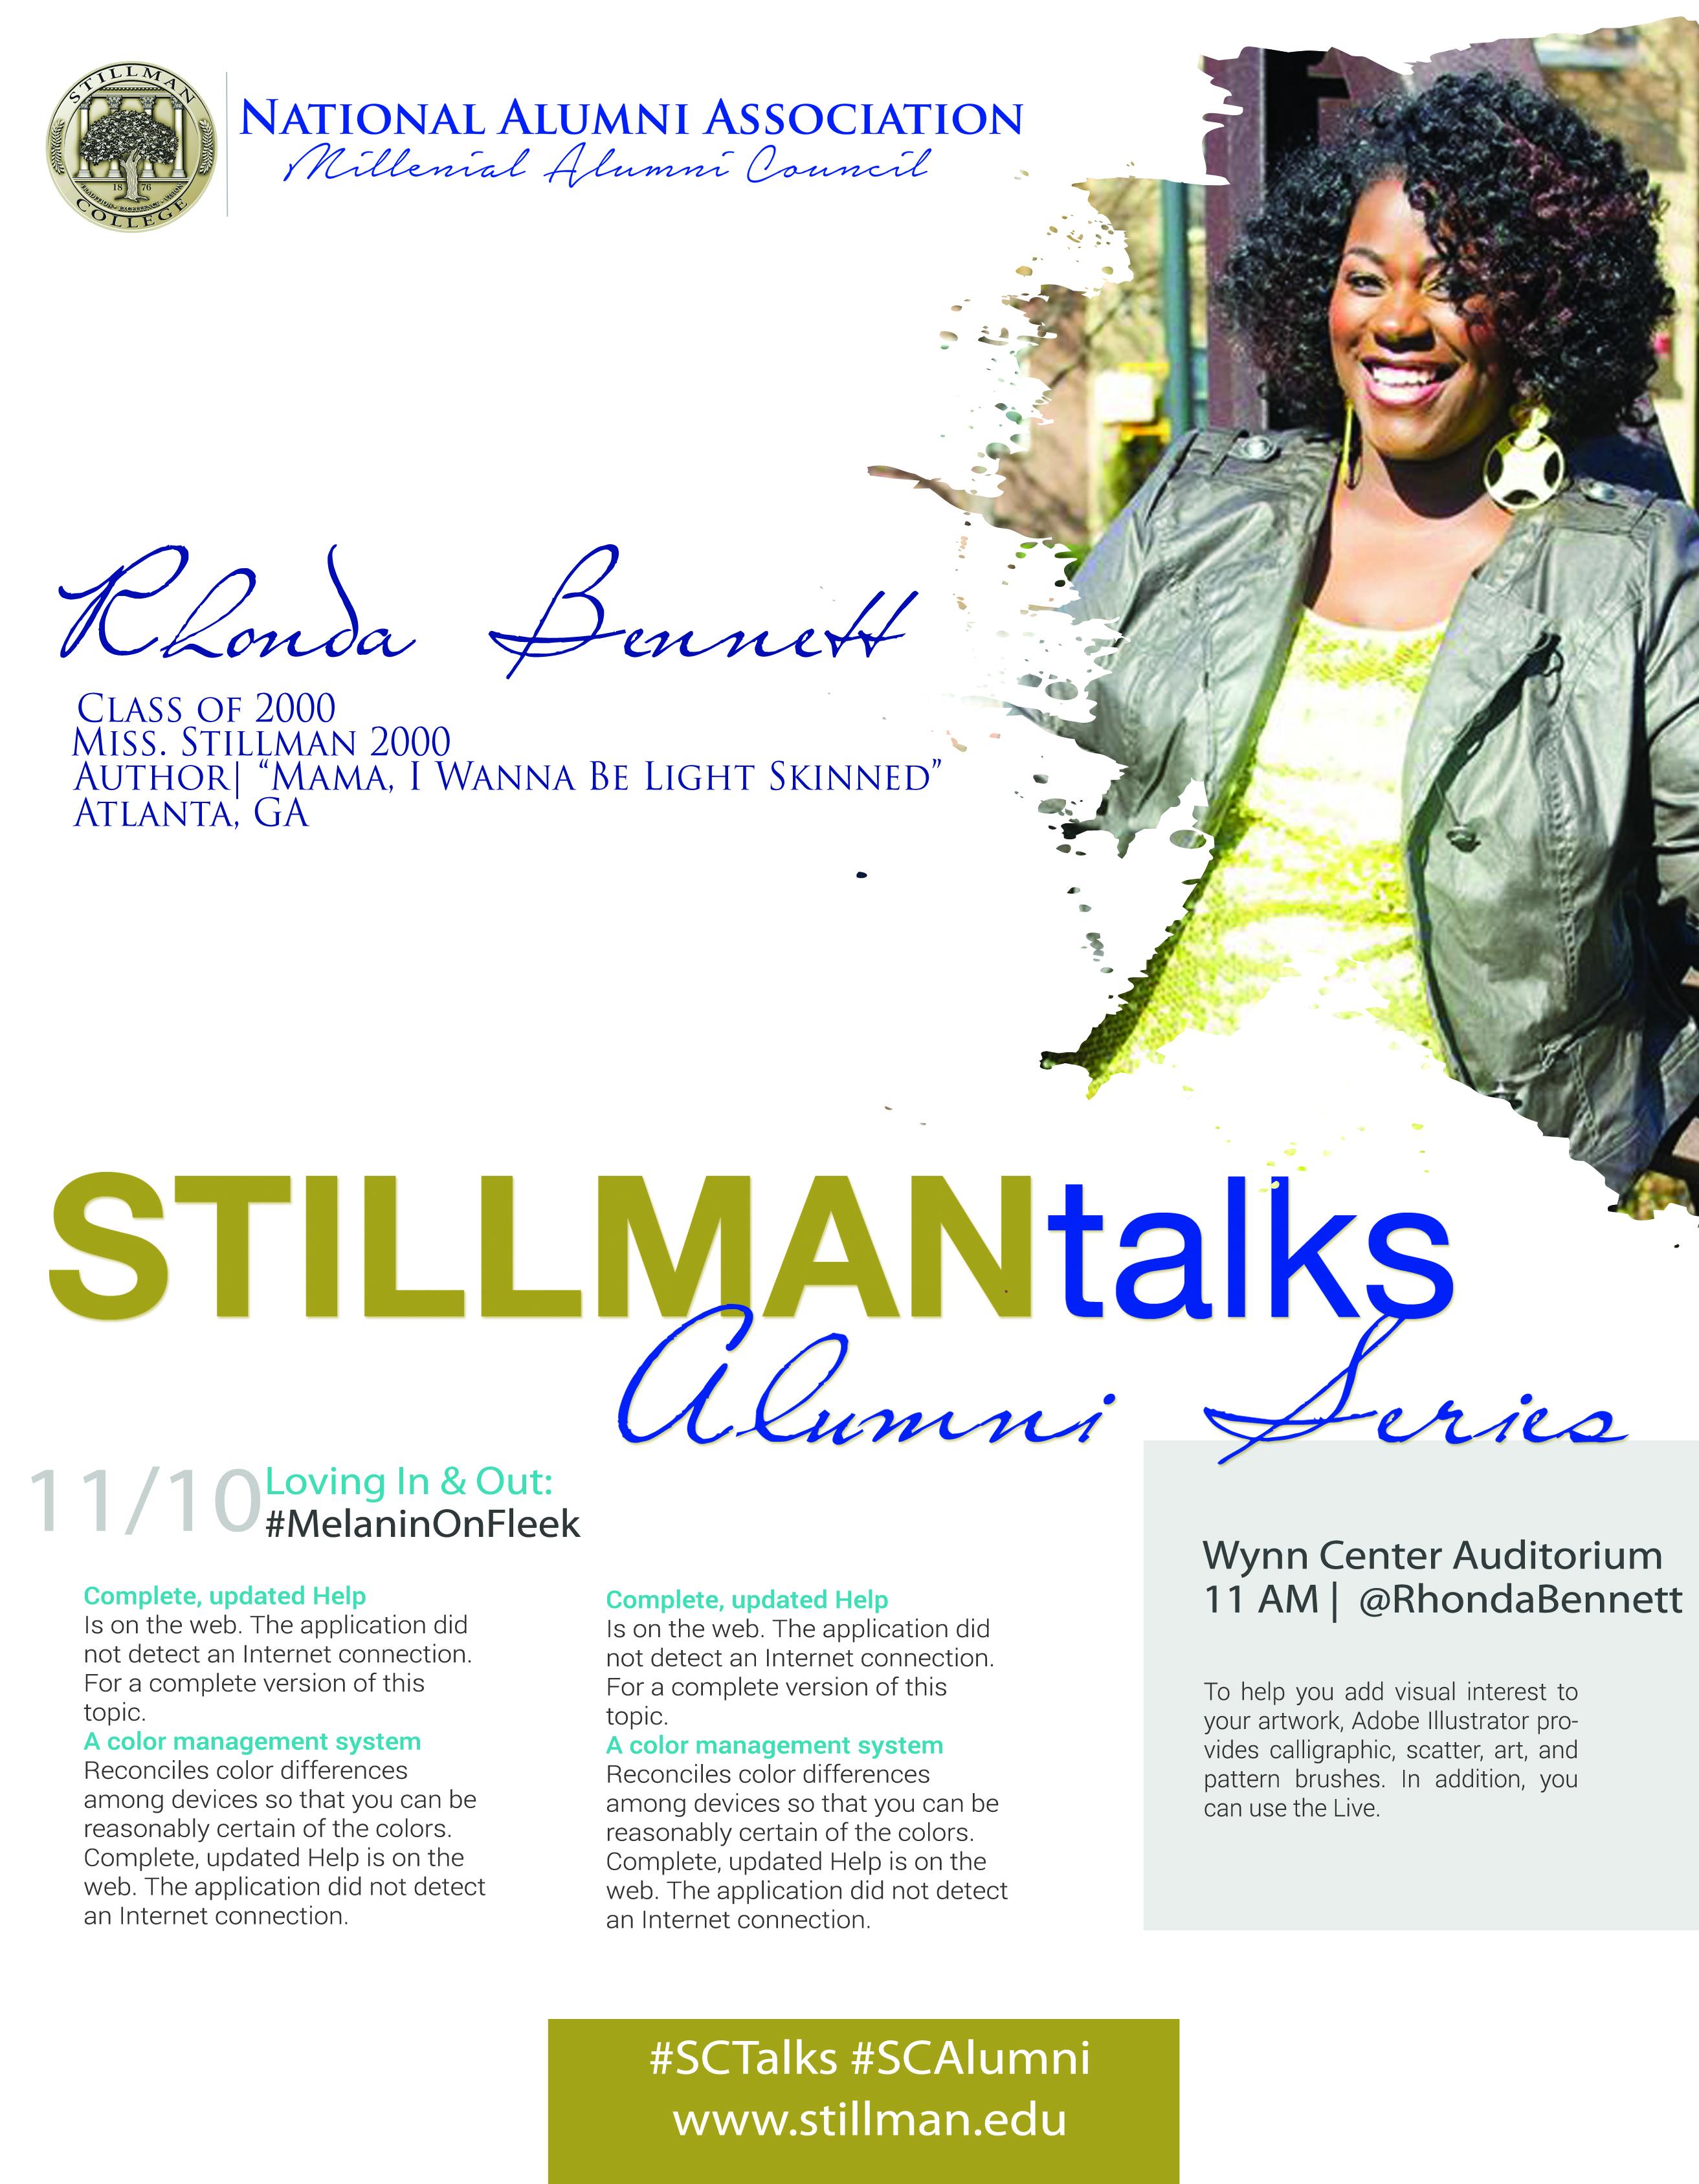 Alumni Talks Flyer_RhondaBennett.jpg